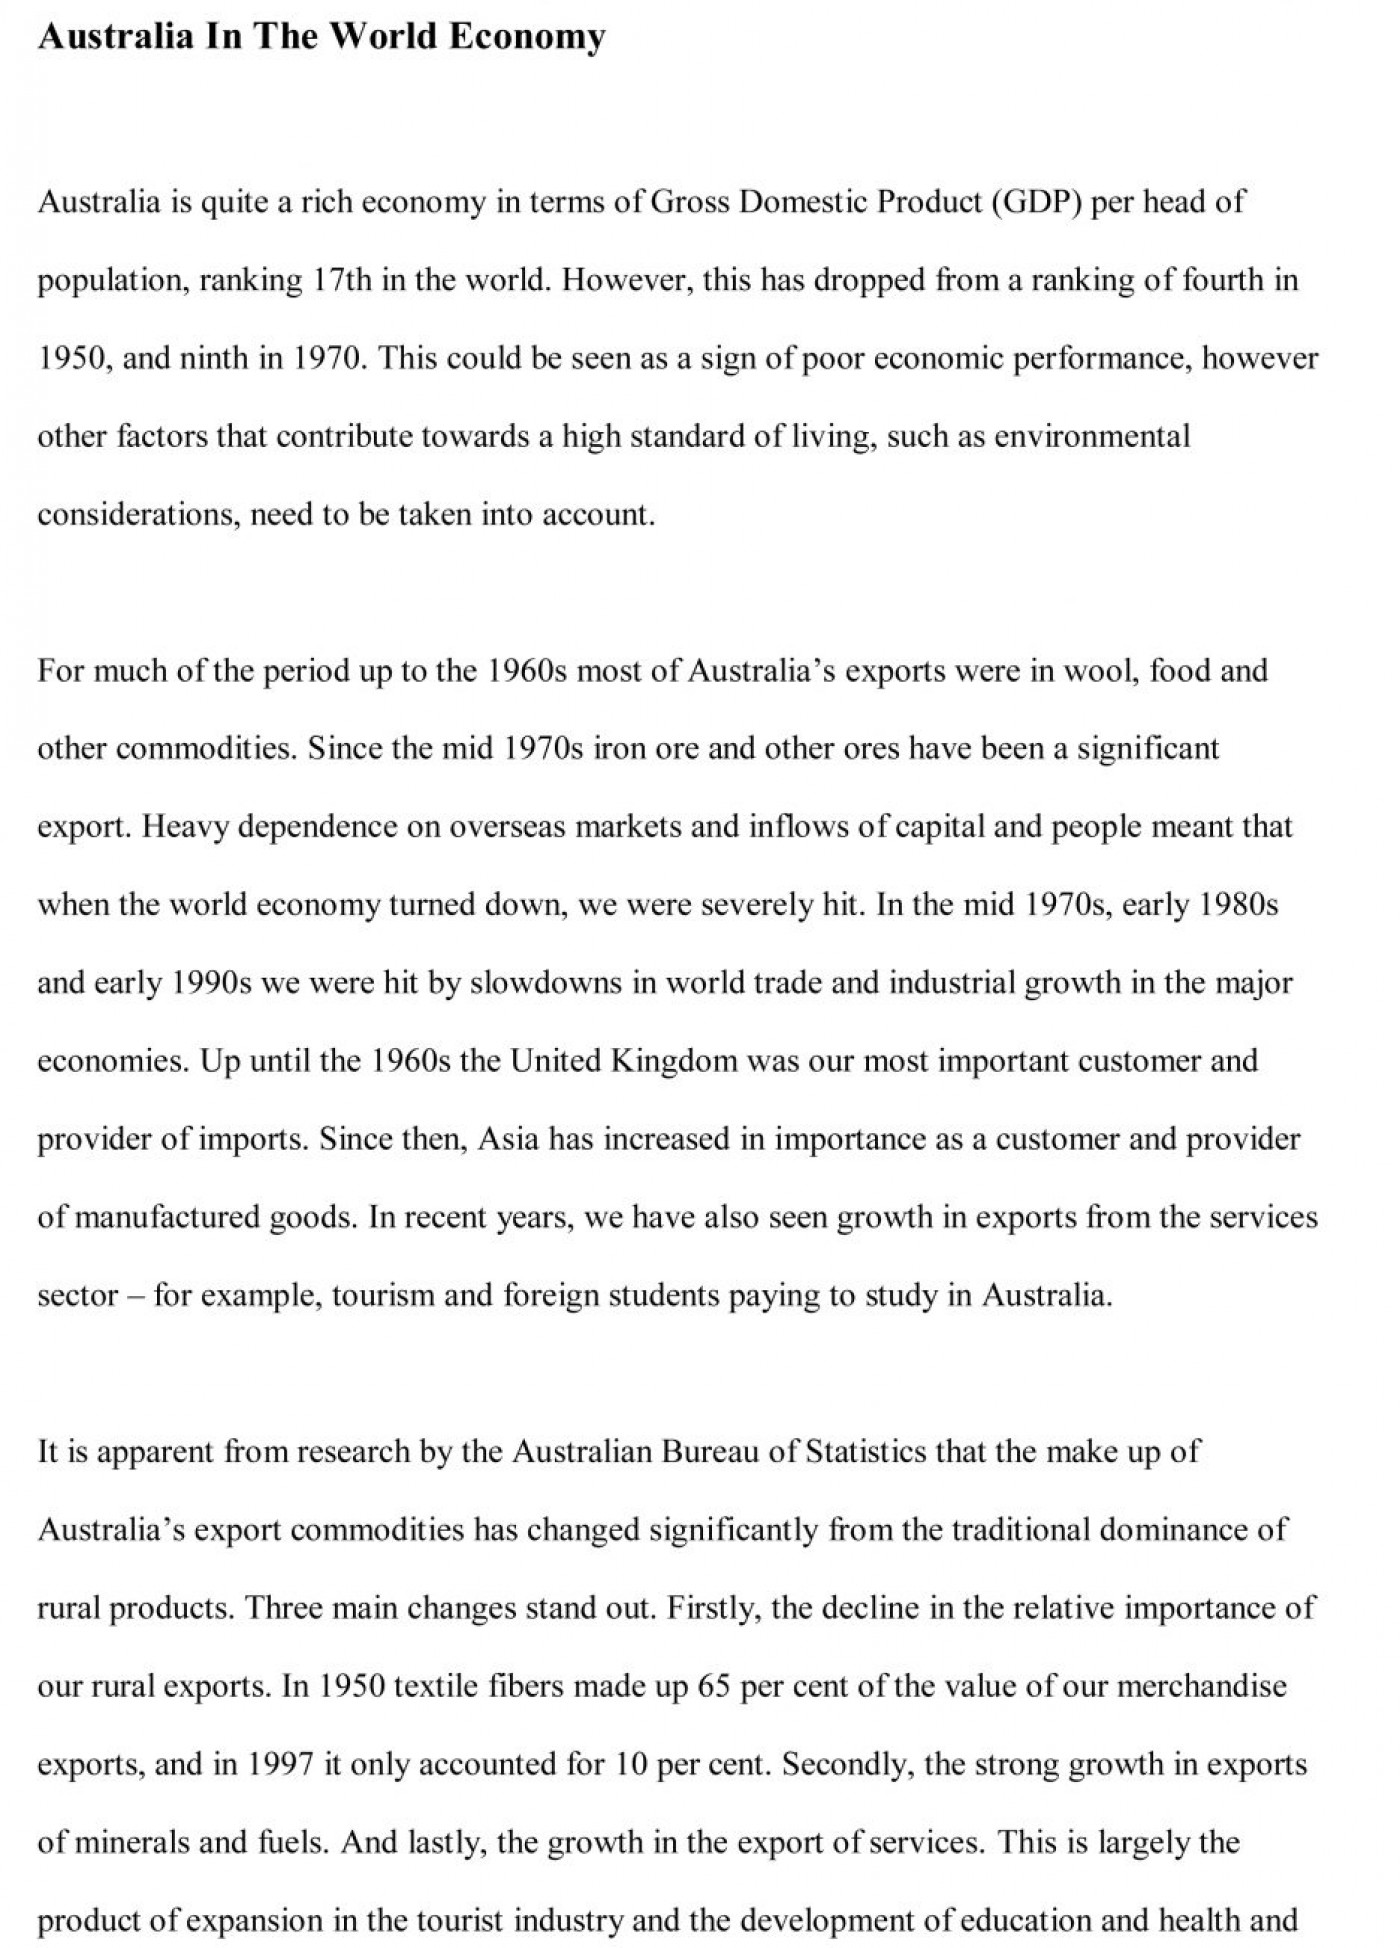 010 This Believe Essays Economics Sample Npr I Narrative